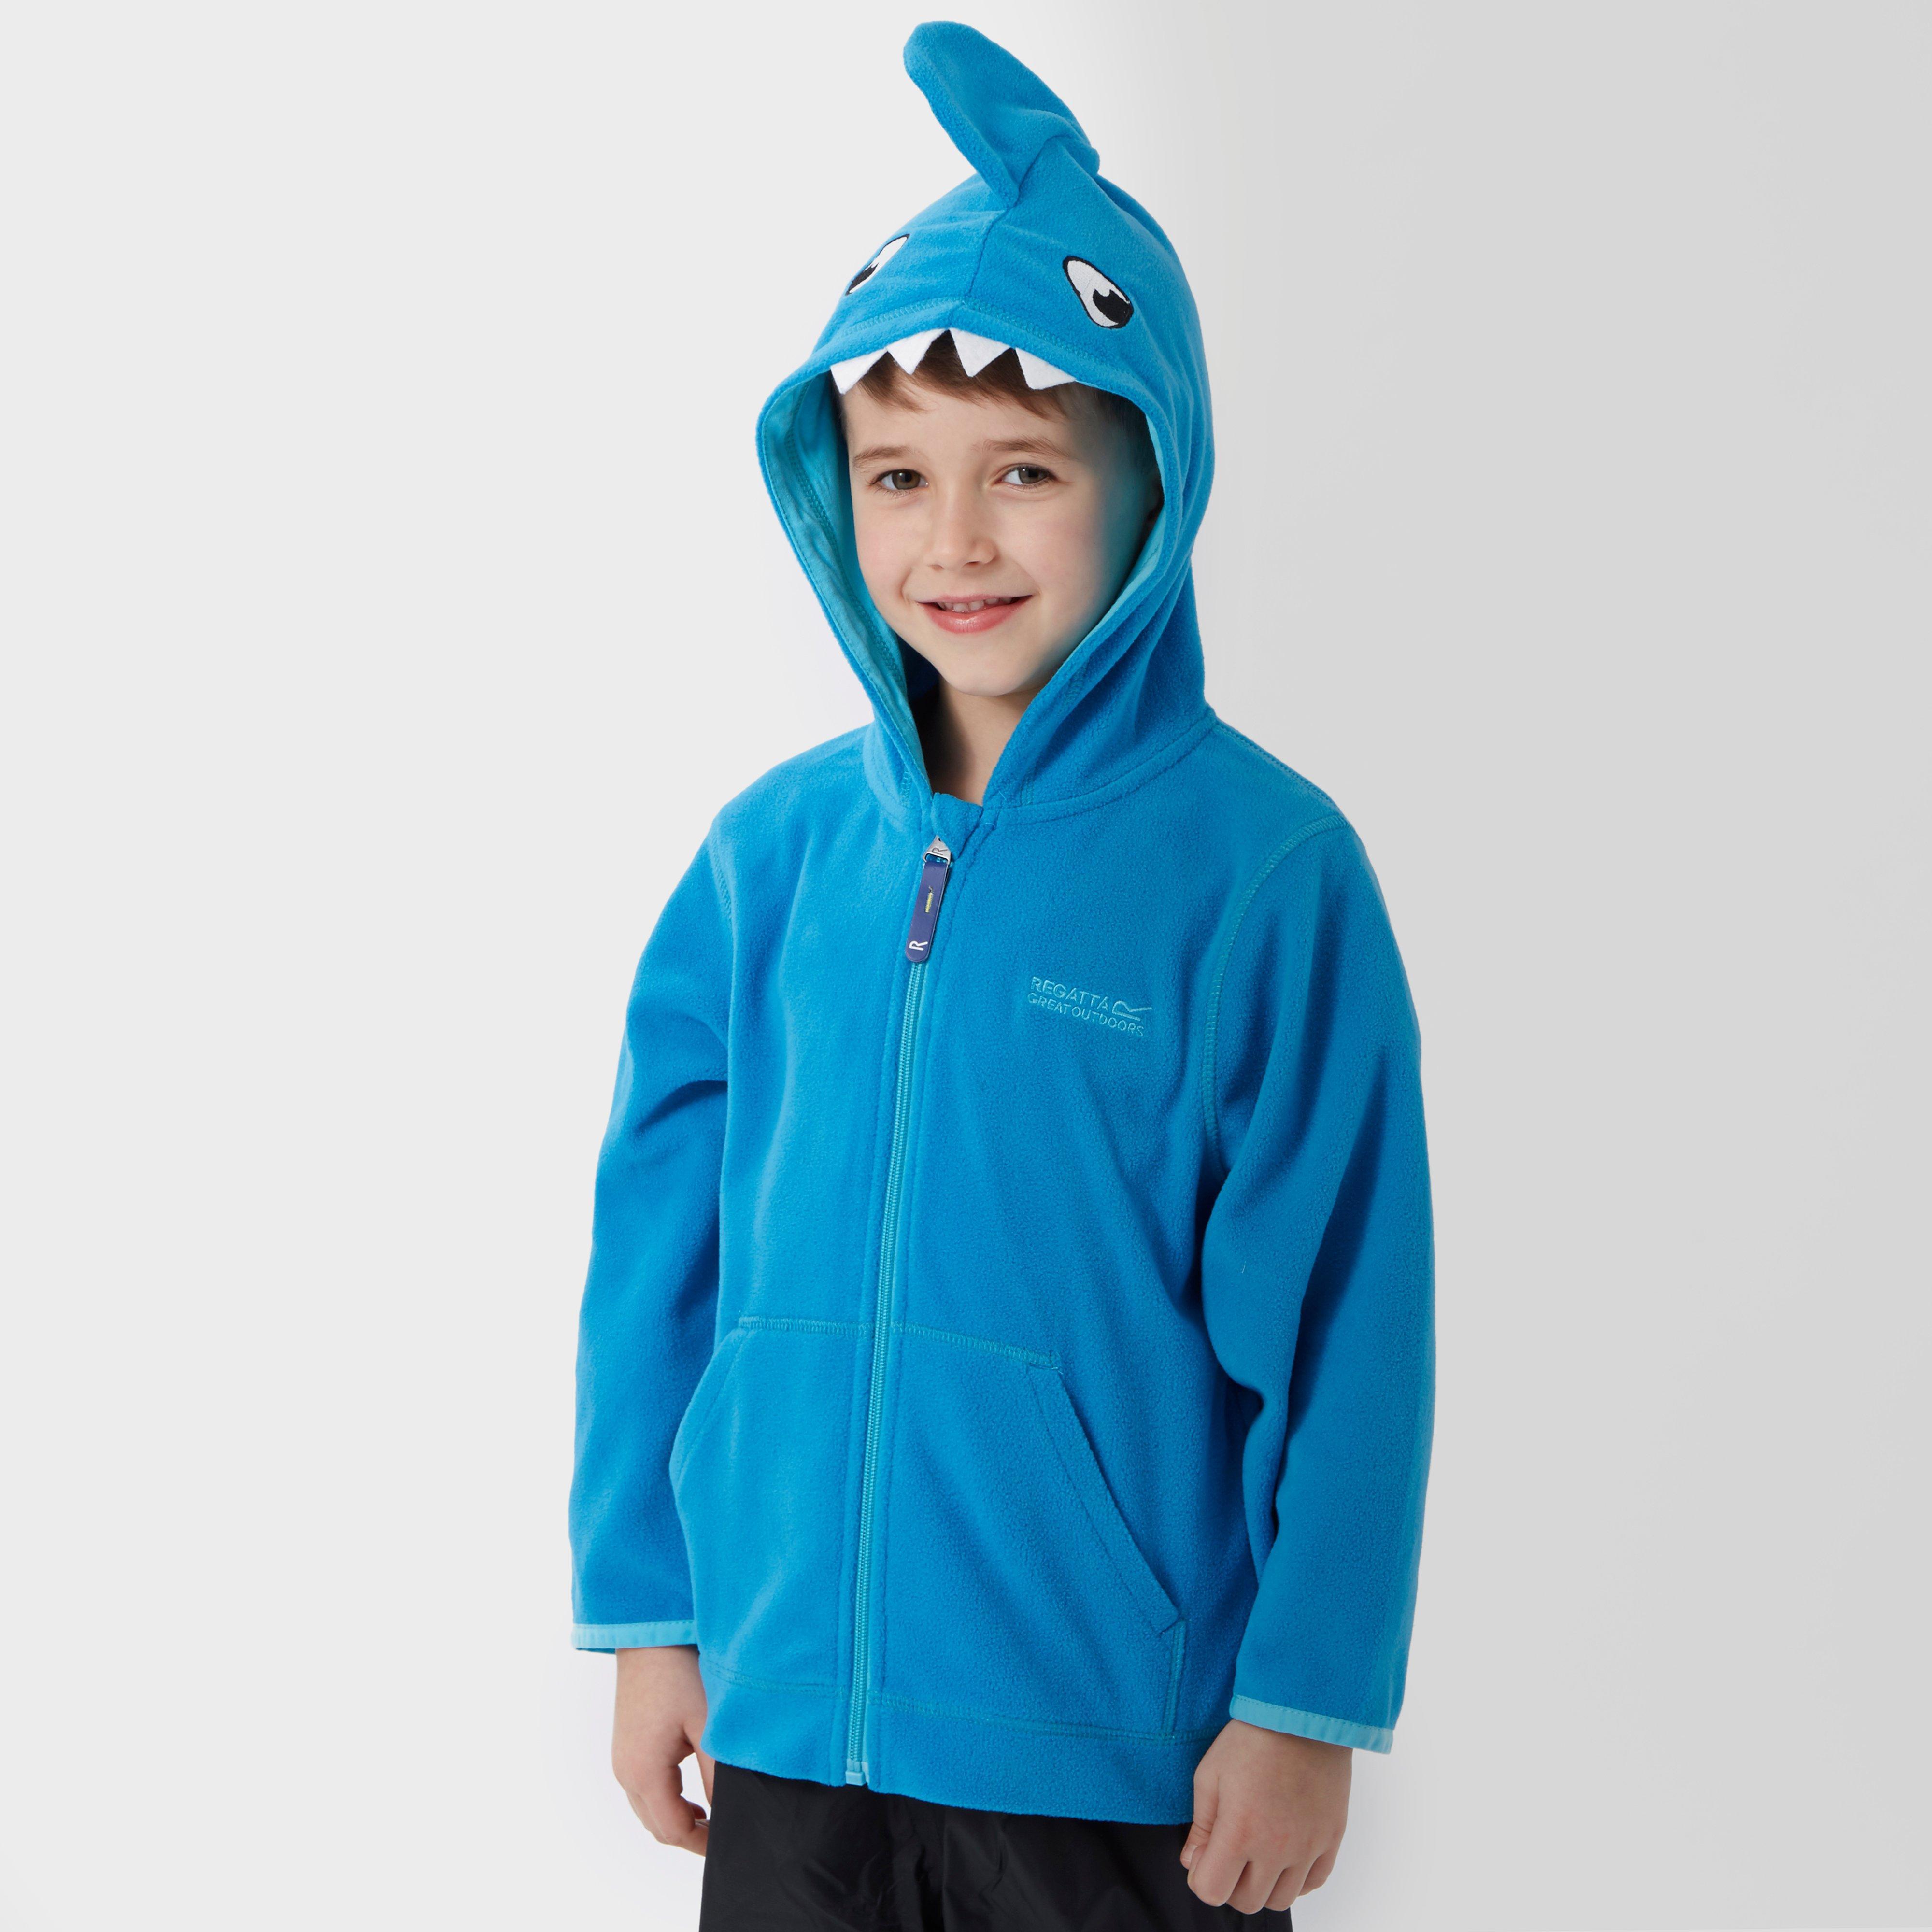 Regatta Boy's Shark Full Zip Fleece Hoodie, Blue